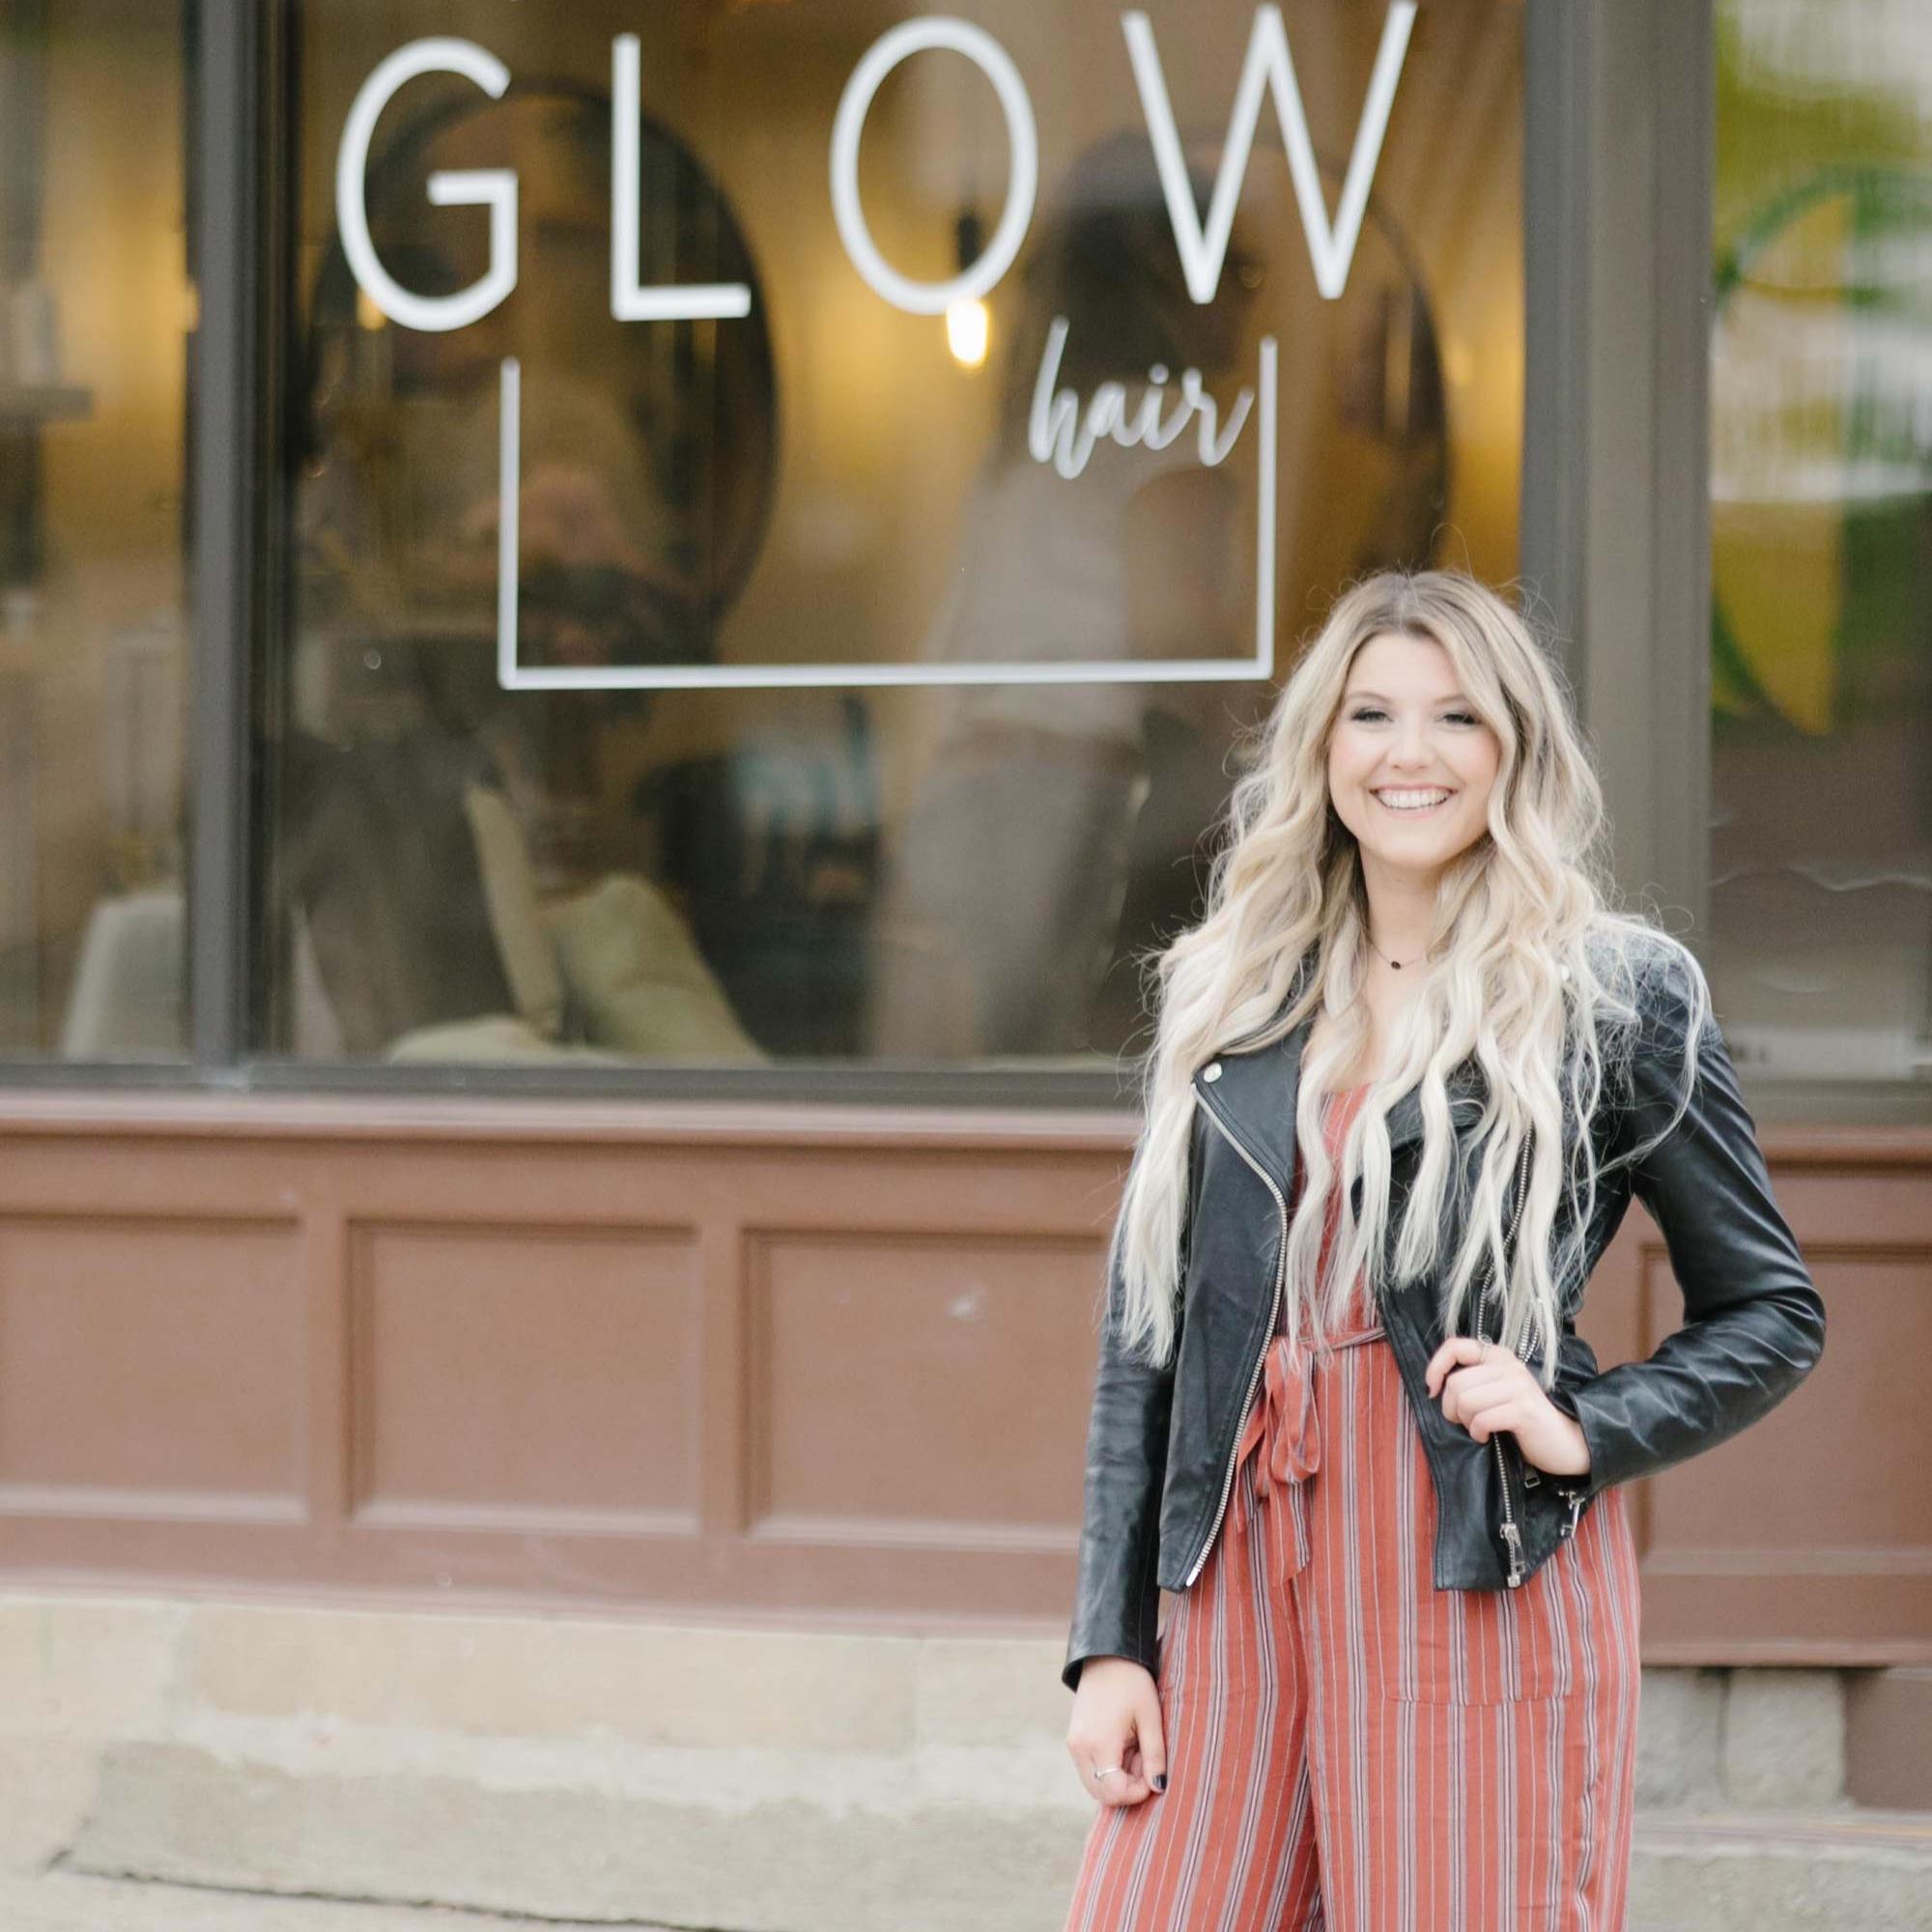 JILLIAN FALCONER - Owner, Glow Hair